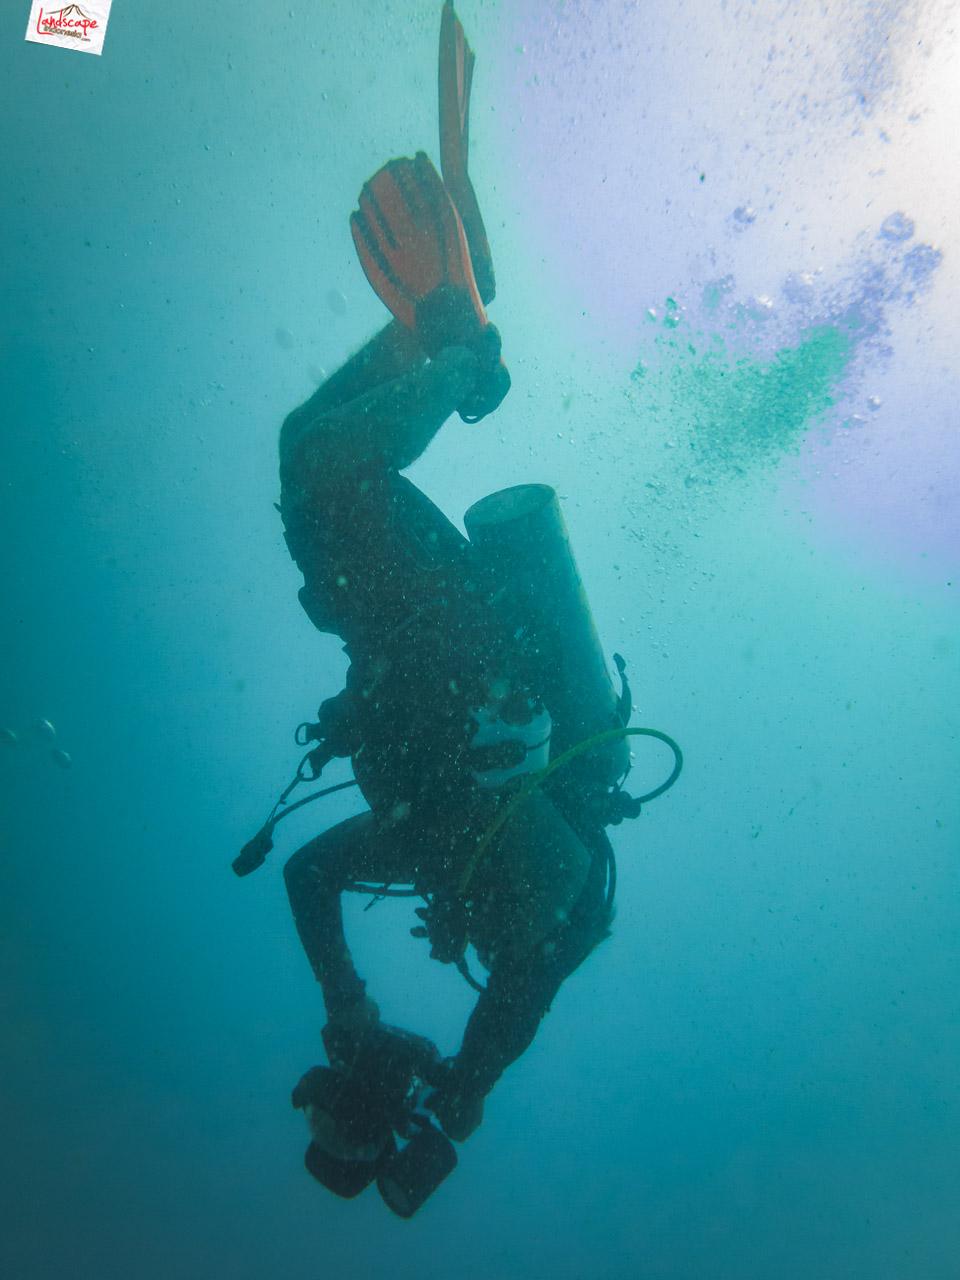 wreck dive kapal ahok 4 - Wreck Dive Kapal Ahok